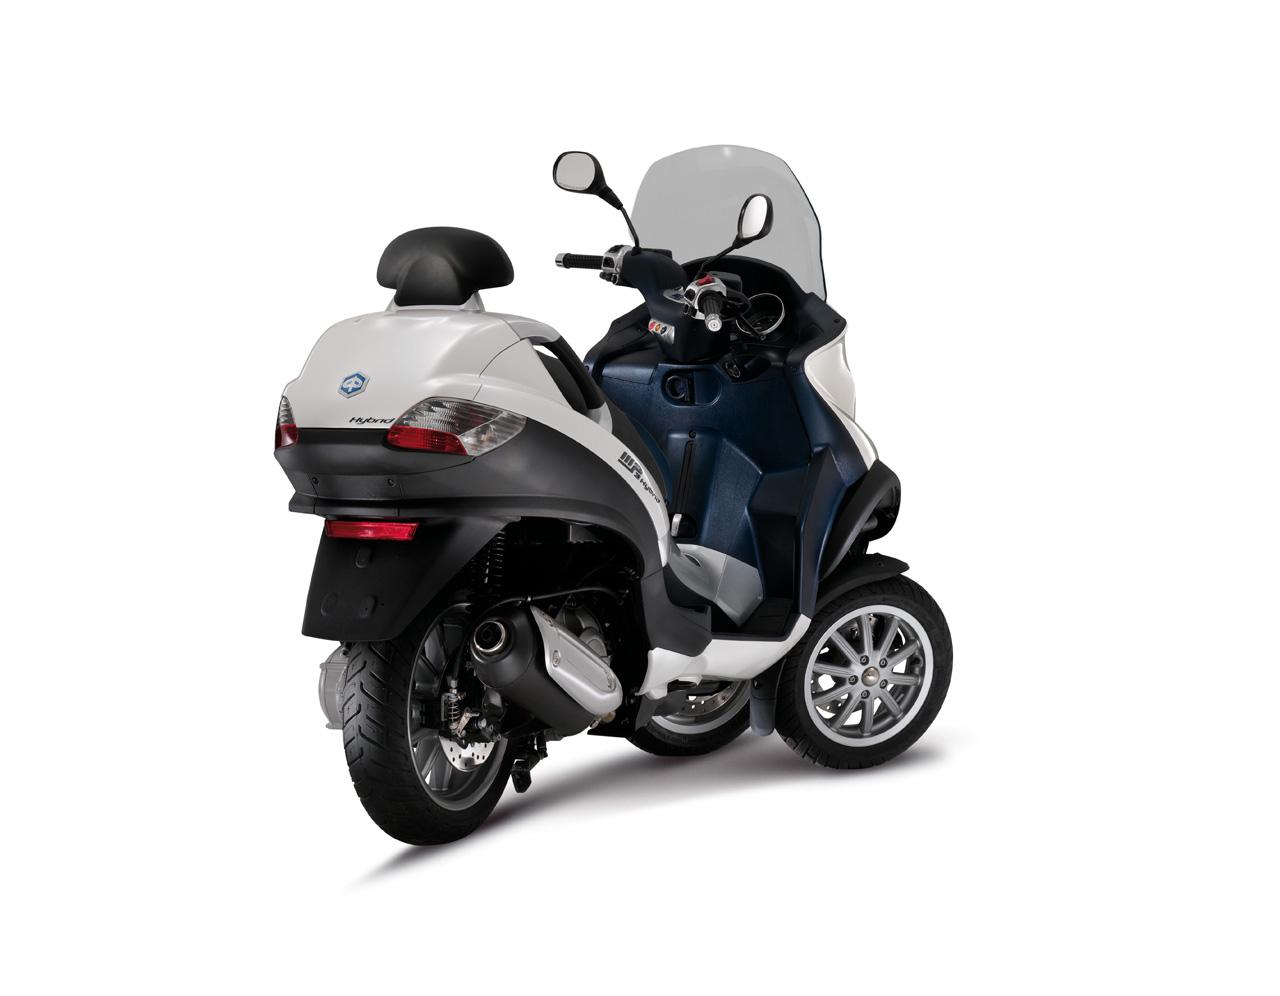 piaggio mp3 roller mit hybrid hytech technologie motorrad news blog. Black Bedroom Furniture Sets. Home Design Ideas